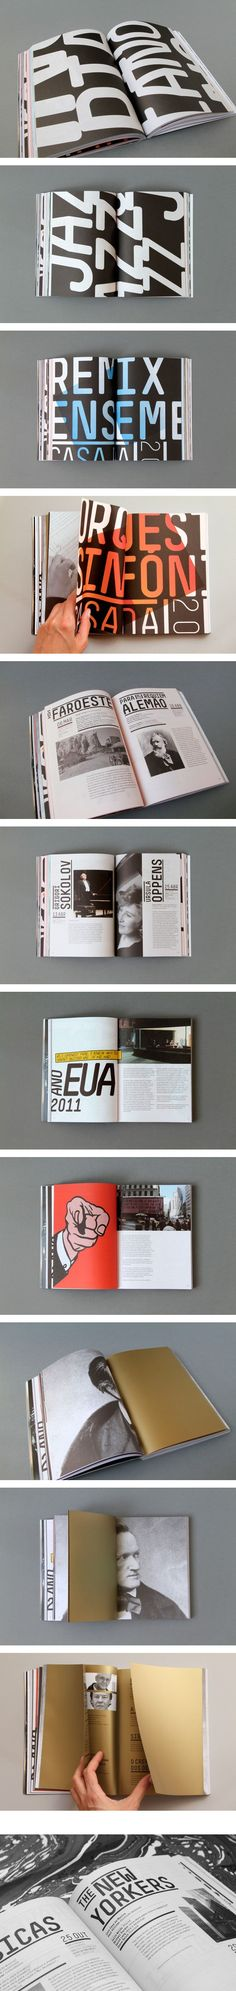 Casa da Música Programme Book Design